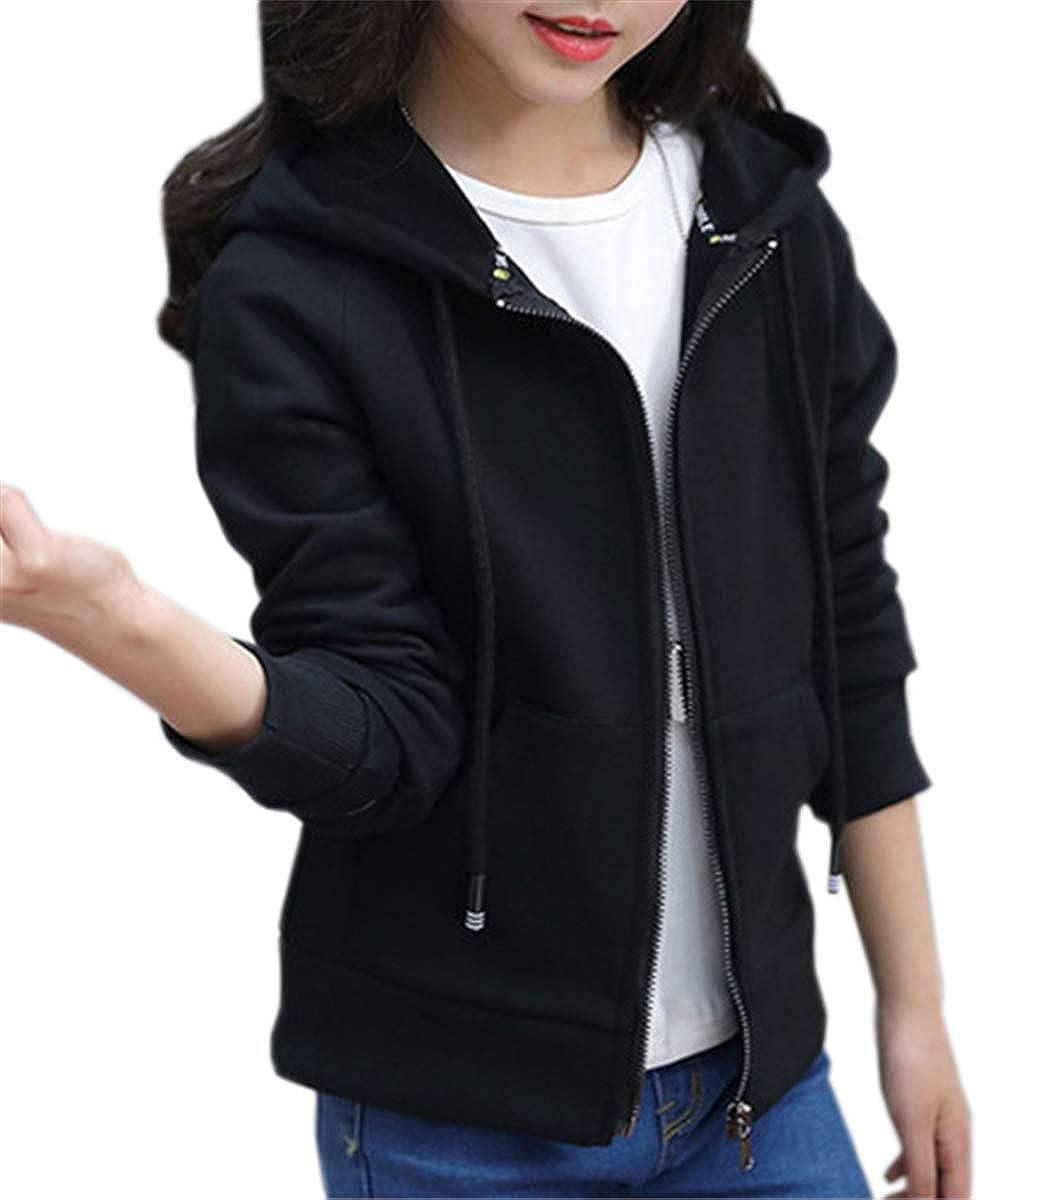 QZH.DUAO Girls Full-Zip Hoodie Sweatshirt Jacket